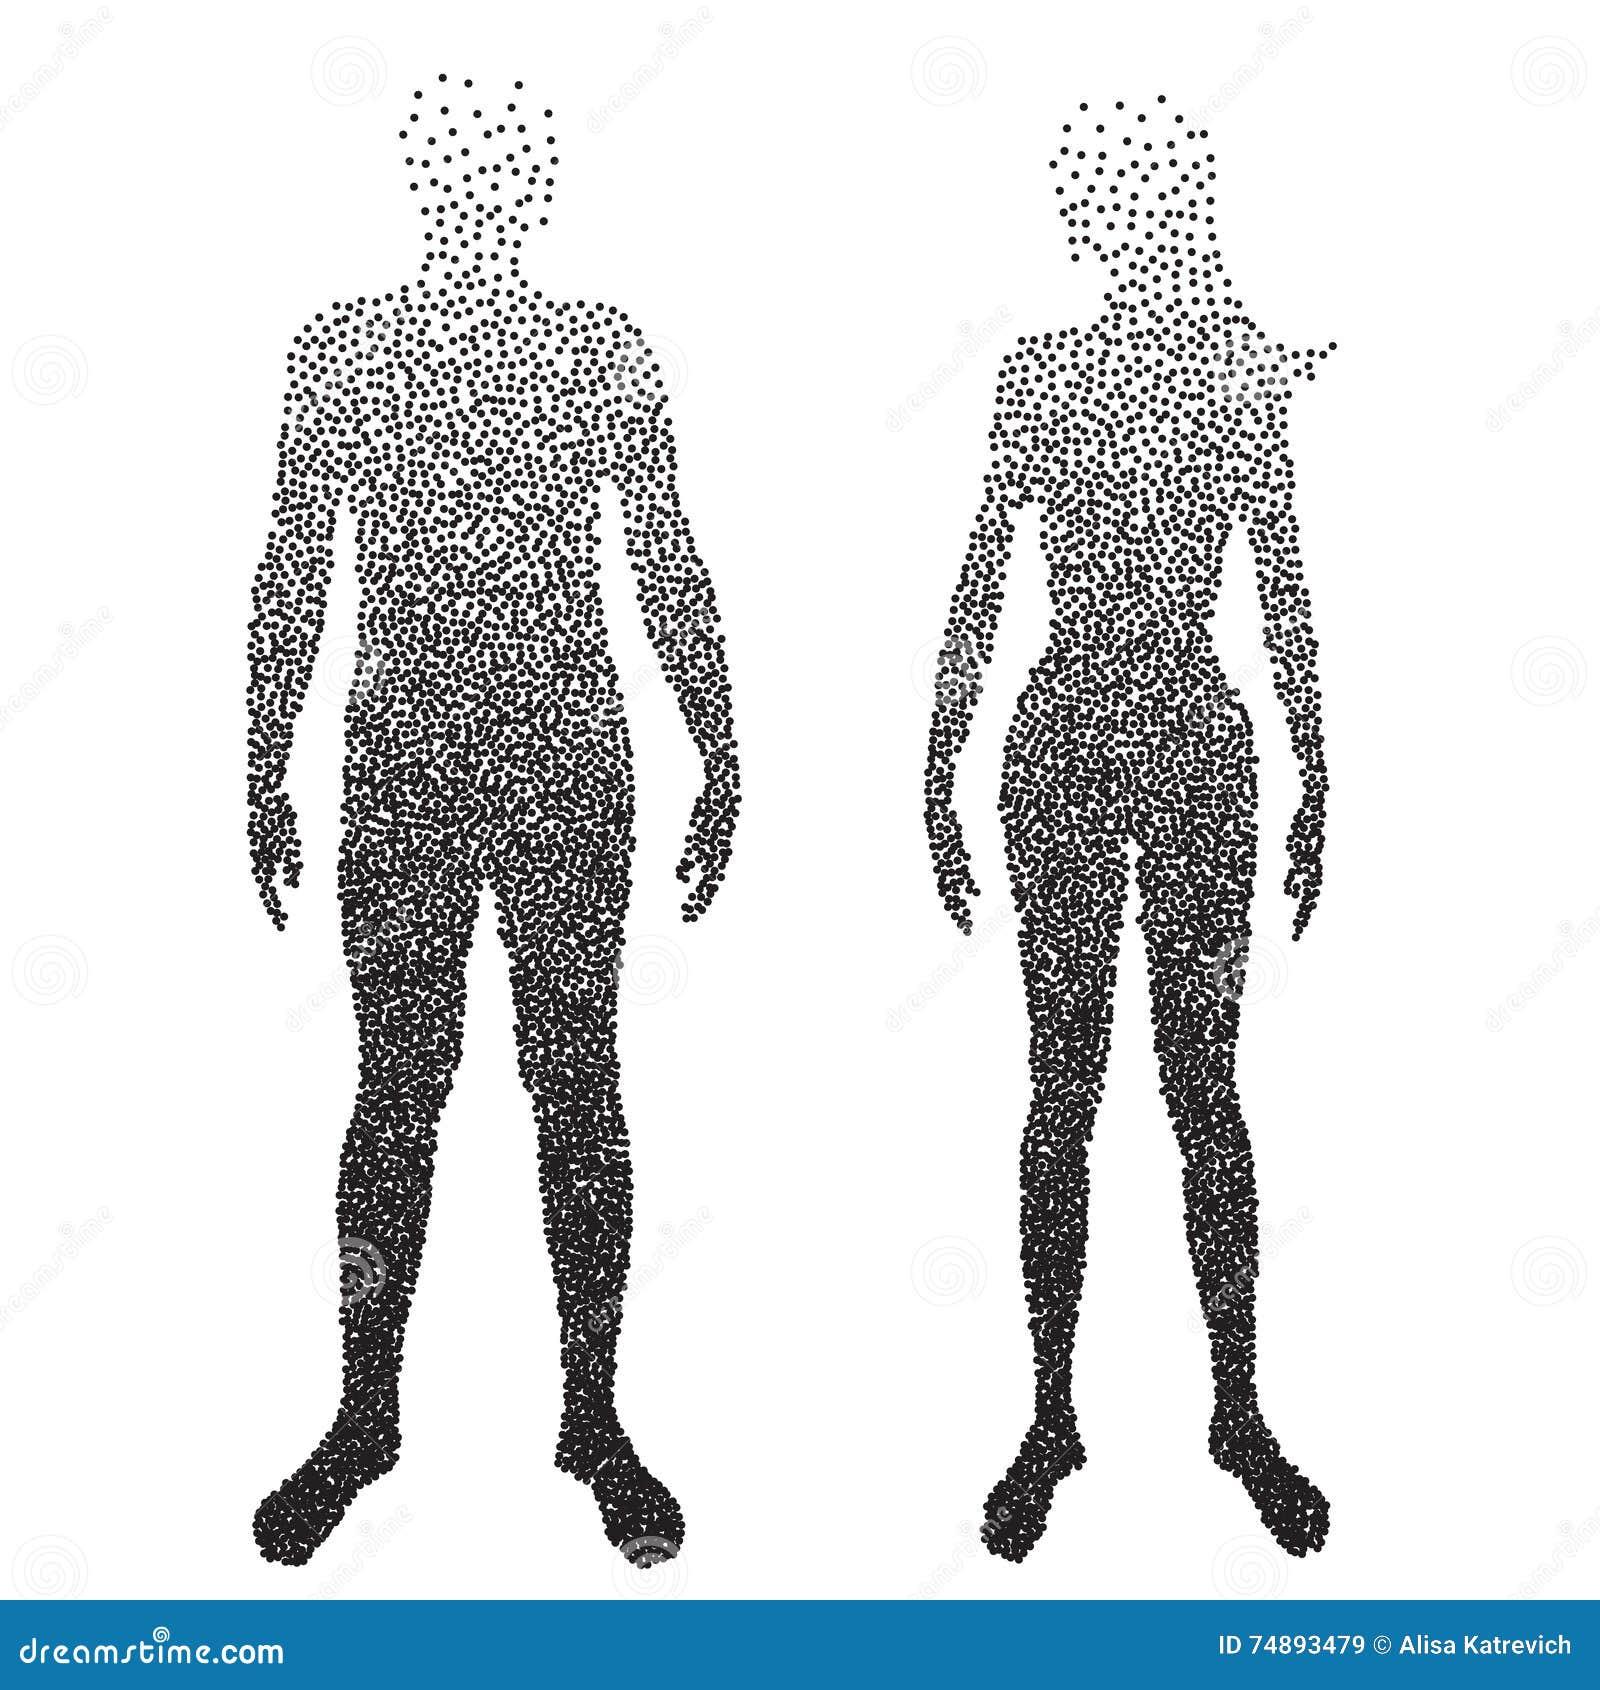 Halftone Body , Male And Female Anatomy, Designed Using Square Dot ...